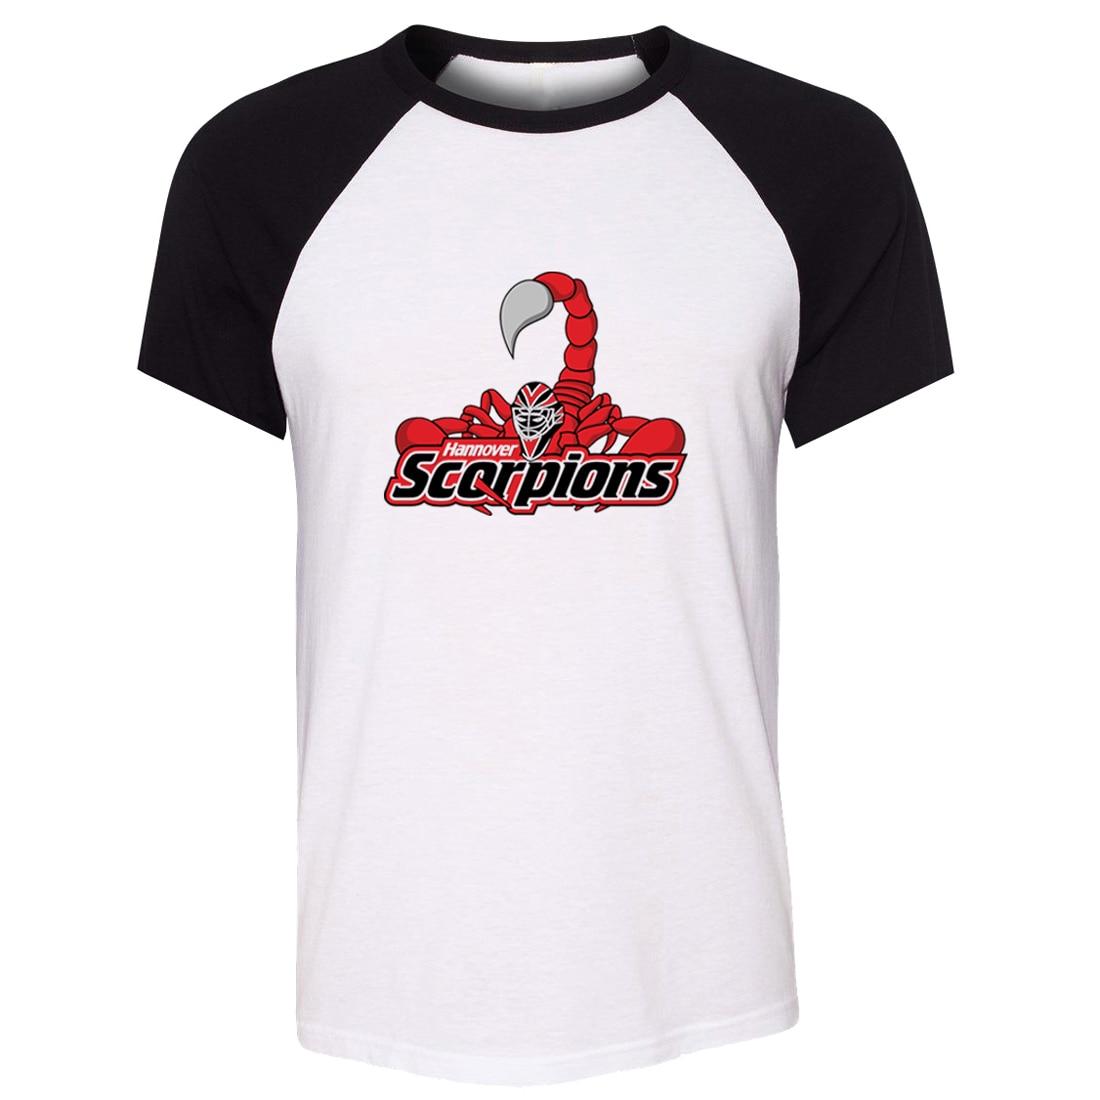 Best deals ) }}iDzn Unisex Summer T-shirt Hannover Scorpions